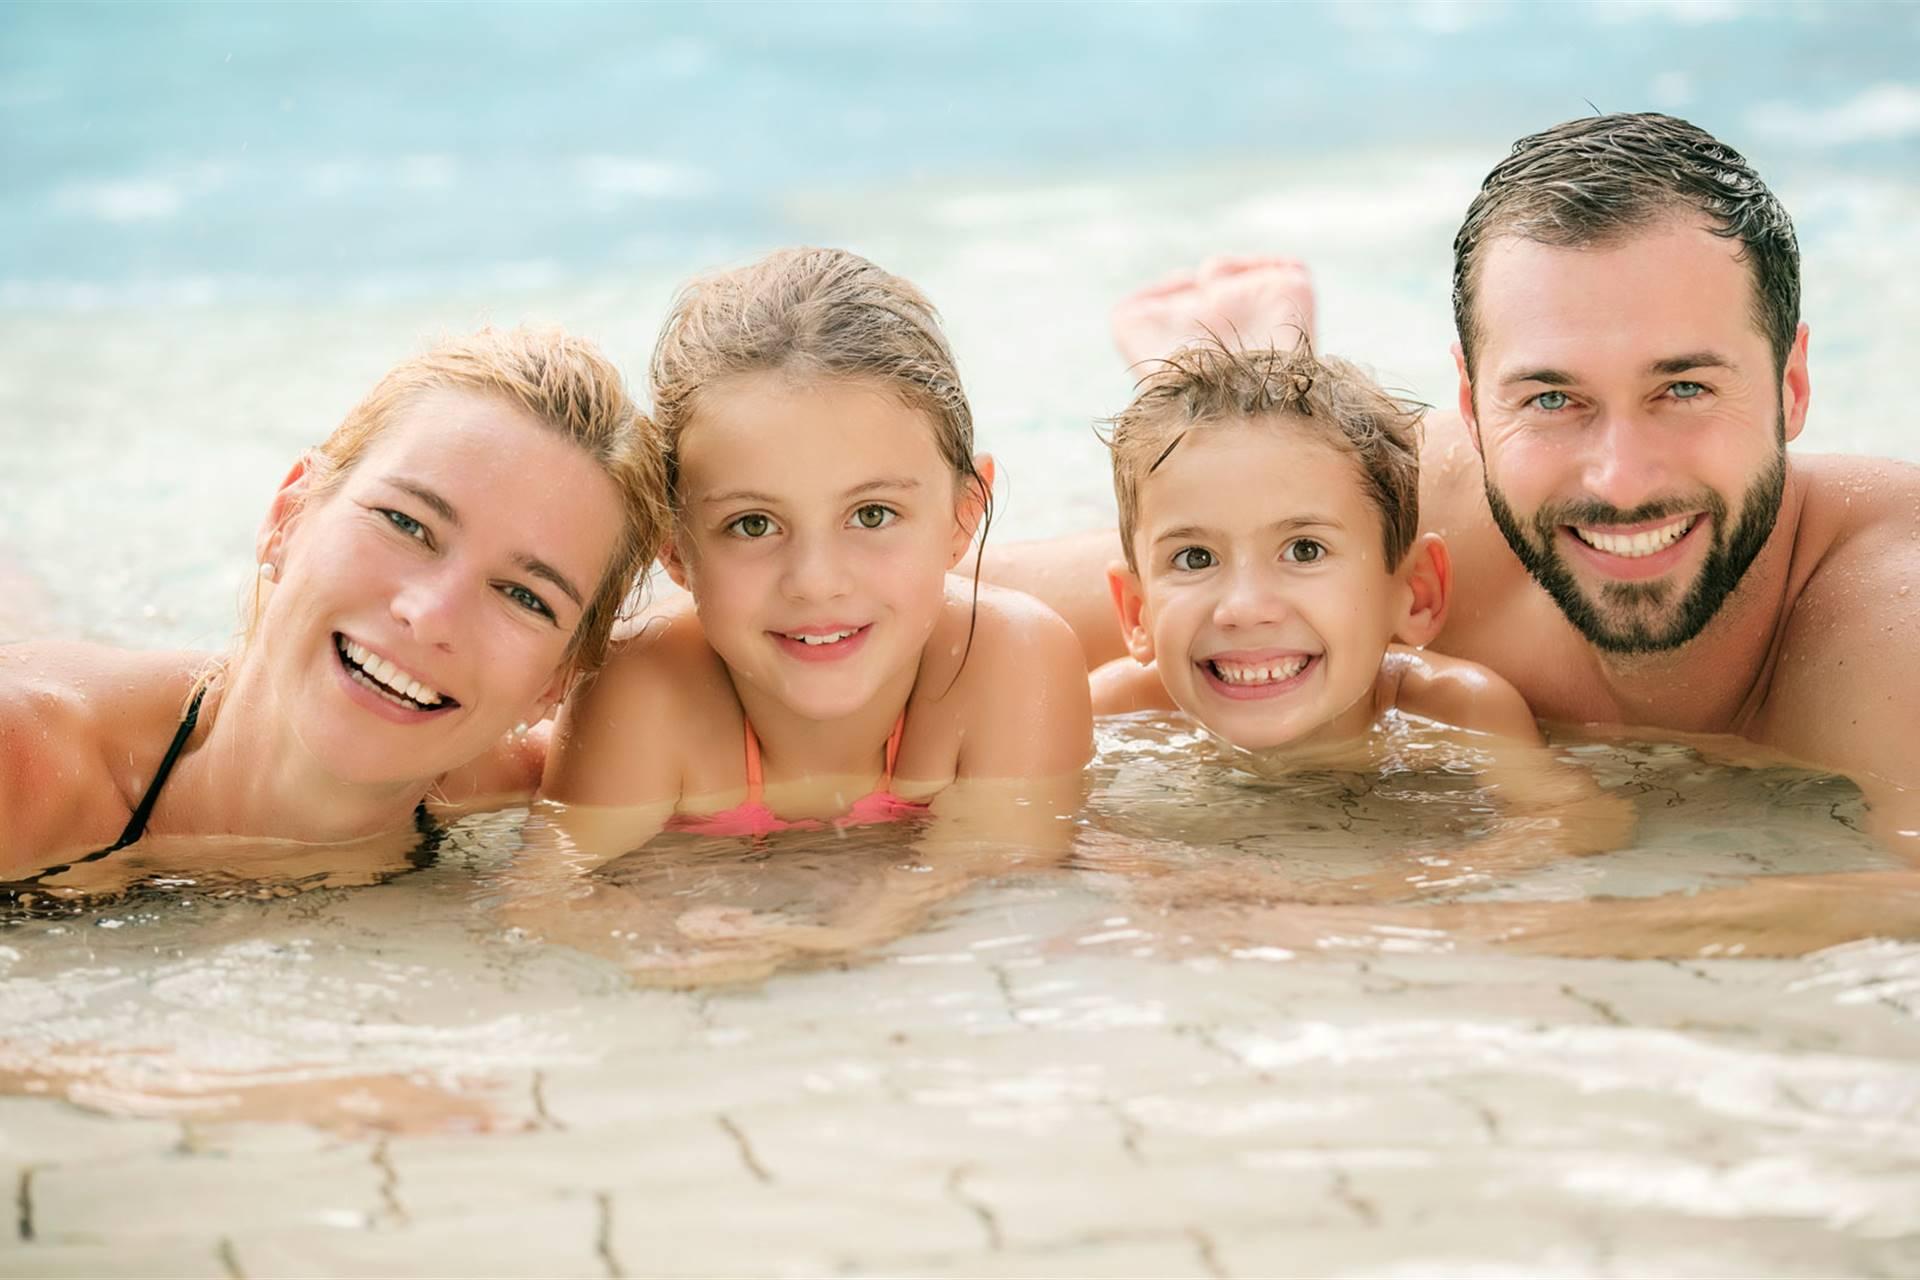 Thermal bath in Styria | H2O Hotel-Therme-Resort in Austria